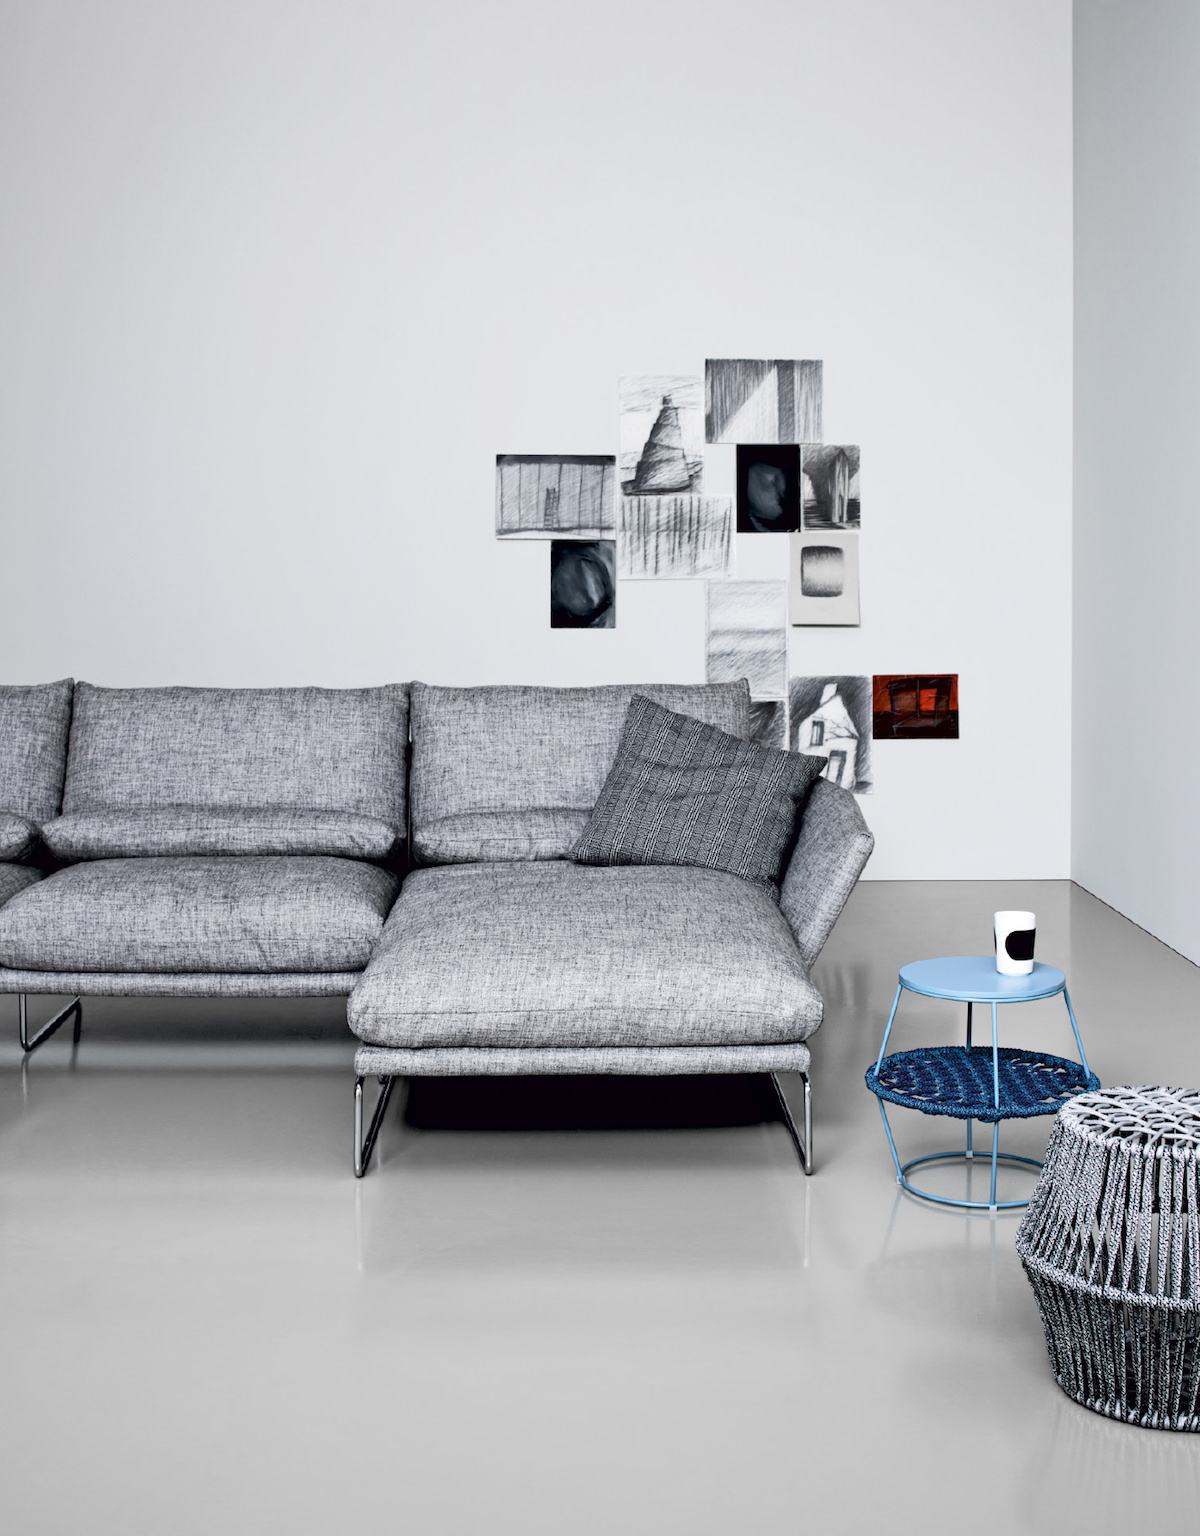 Divani relax design saba italia nysoft 5 rafaschieri for Divani design italia